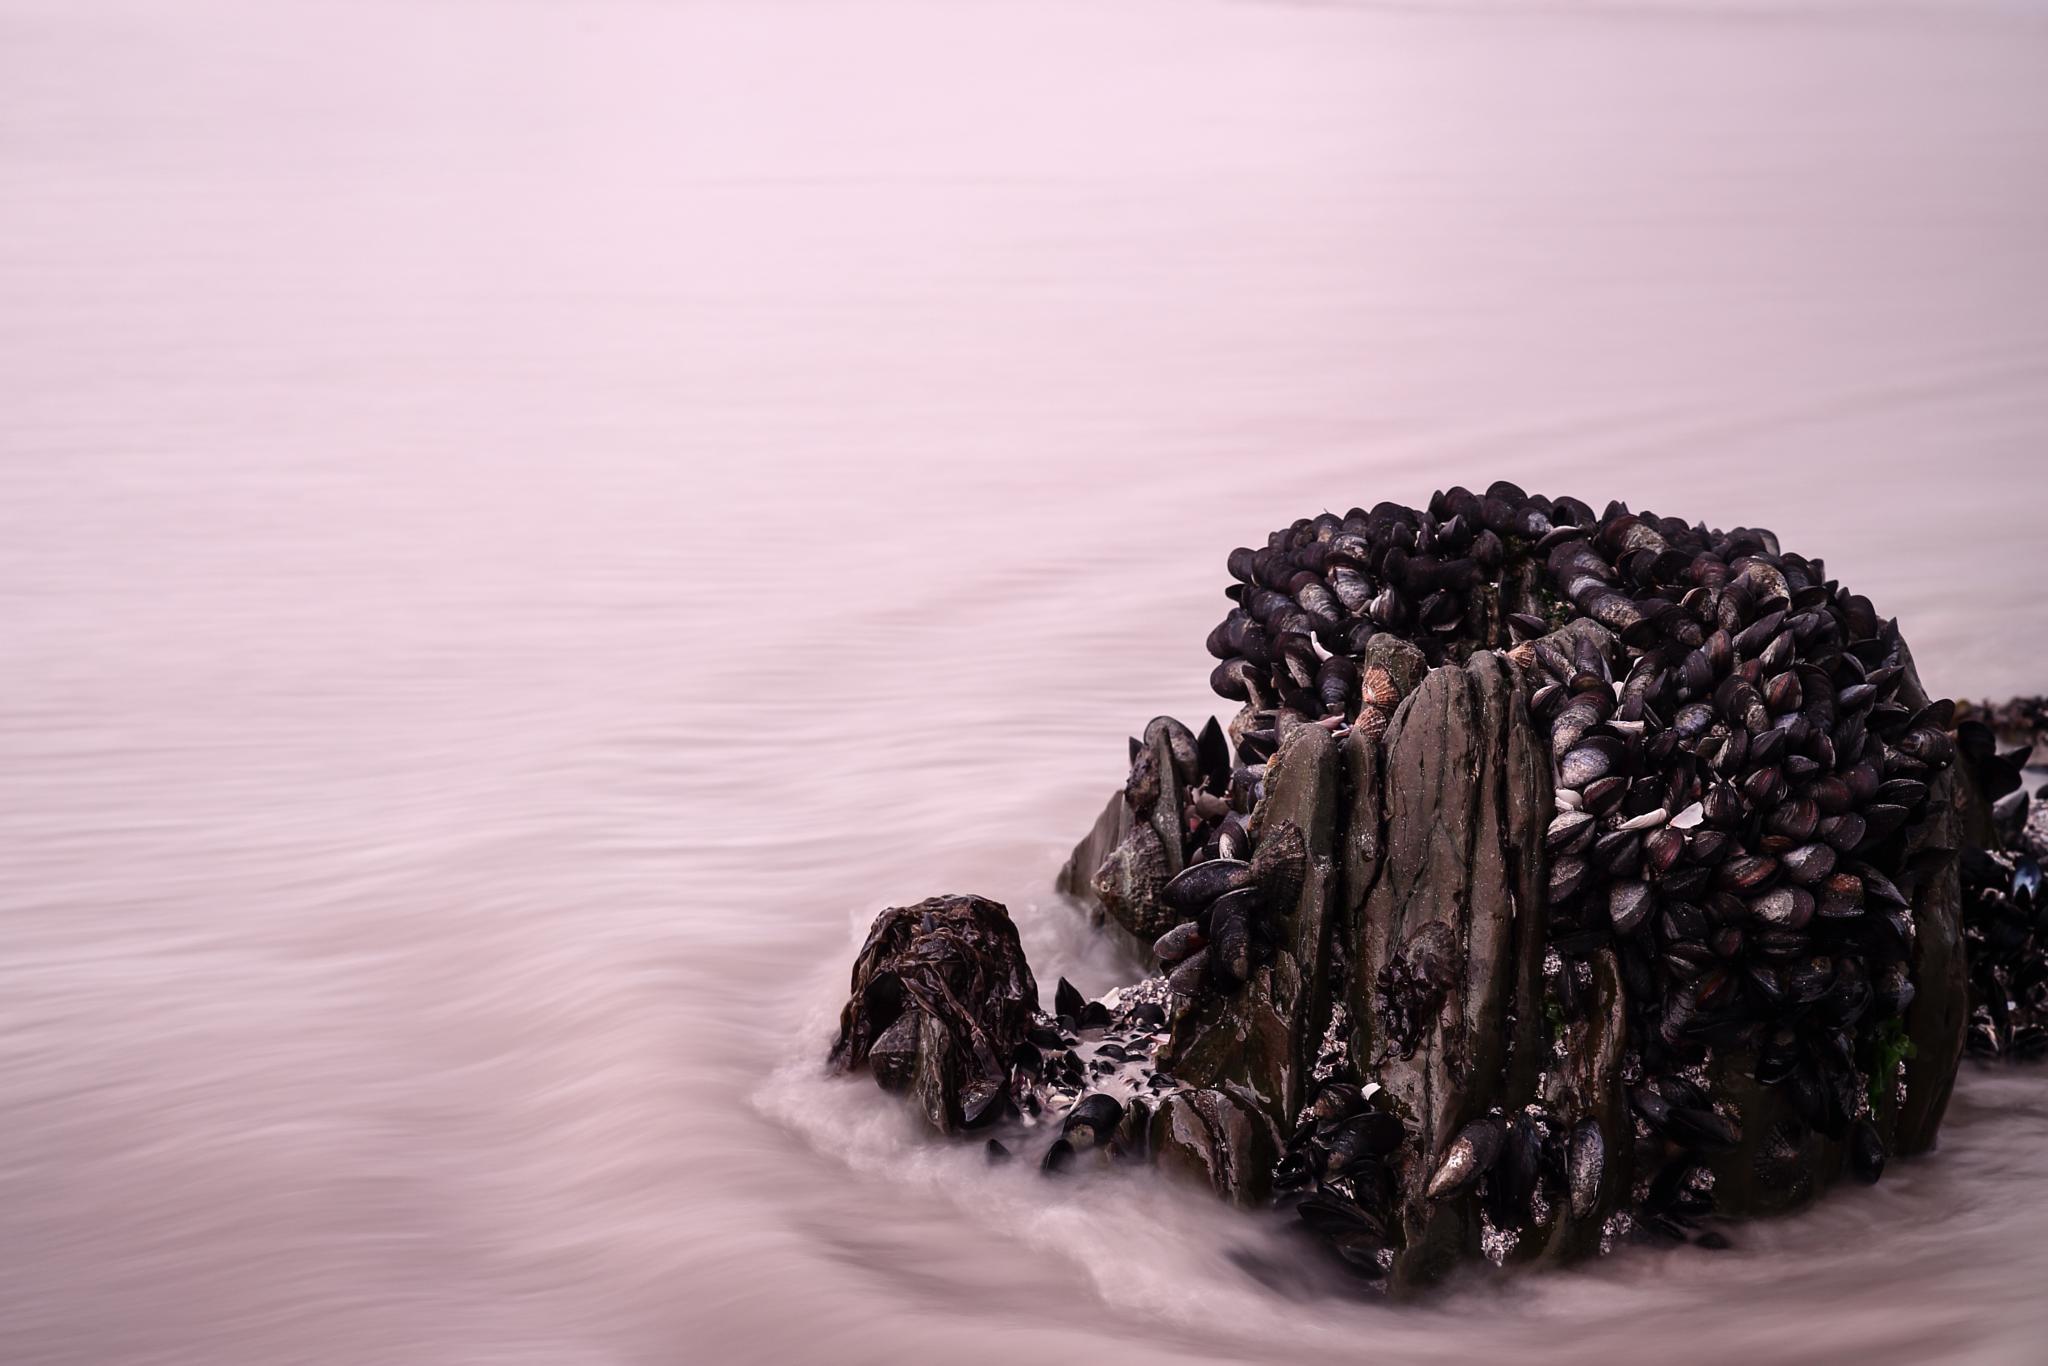 Black mussels  by Stephan Du Toit